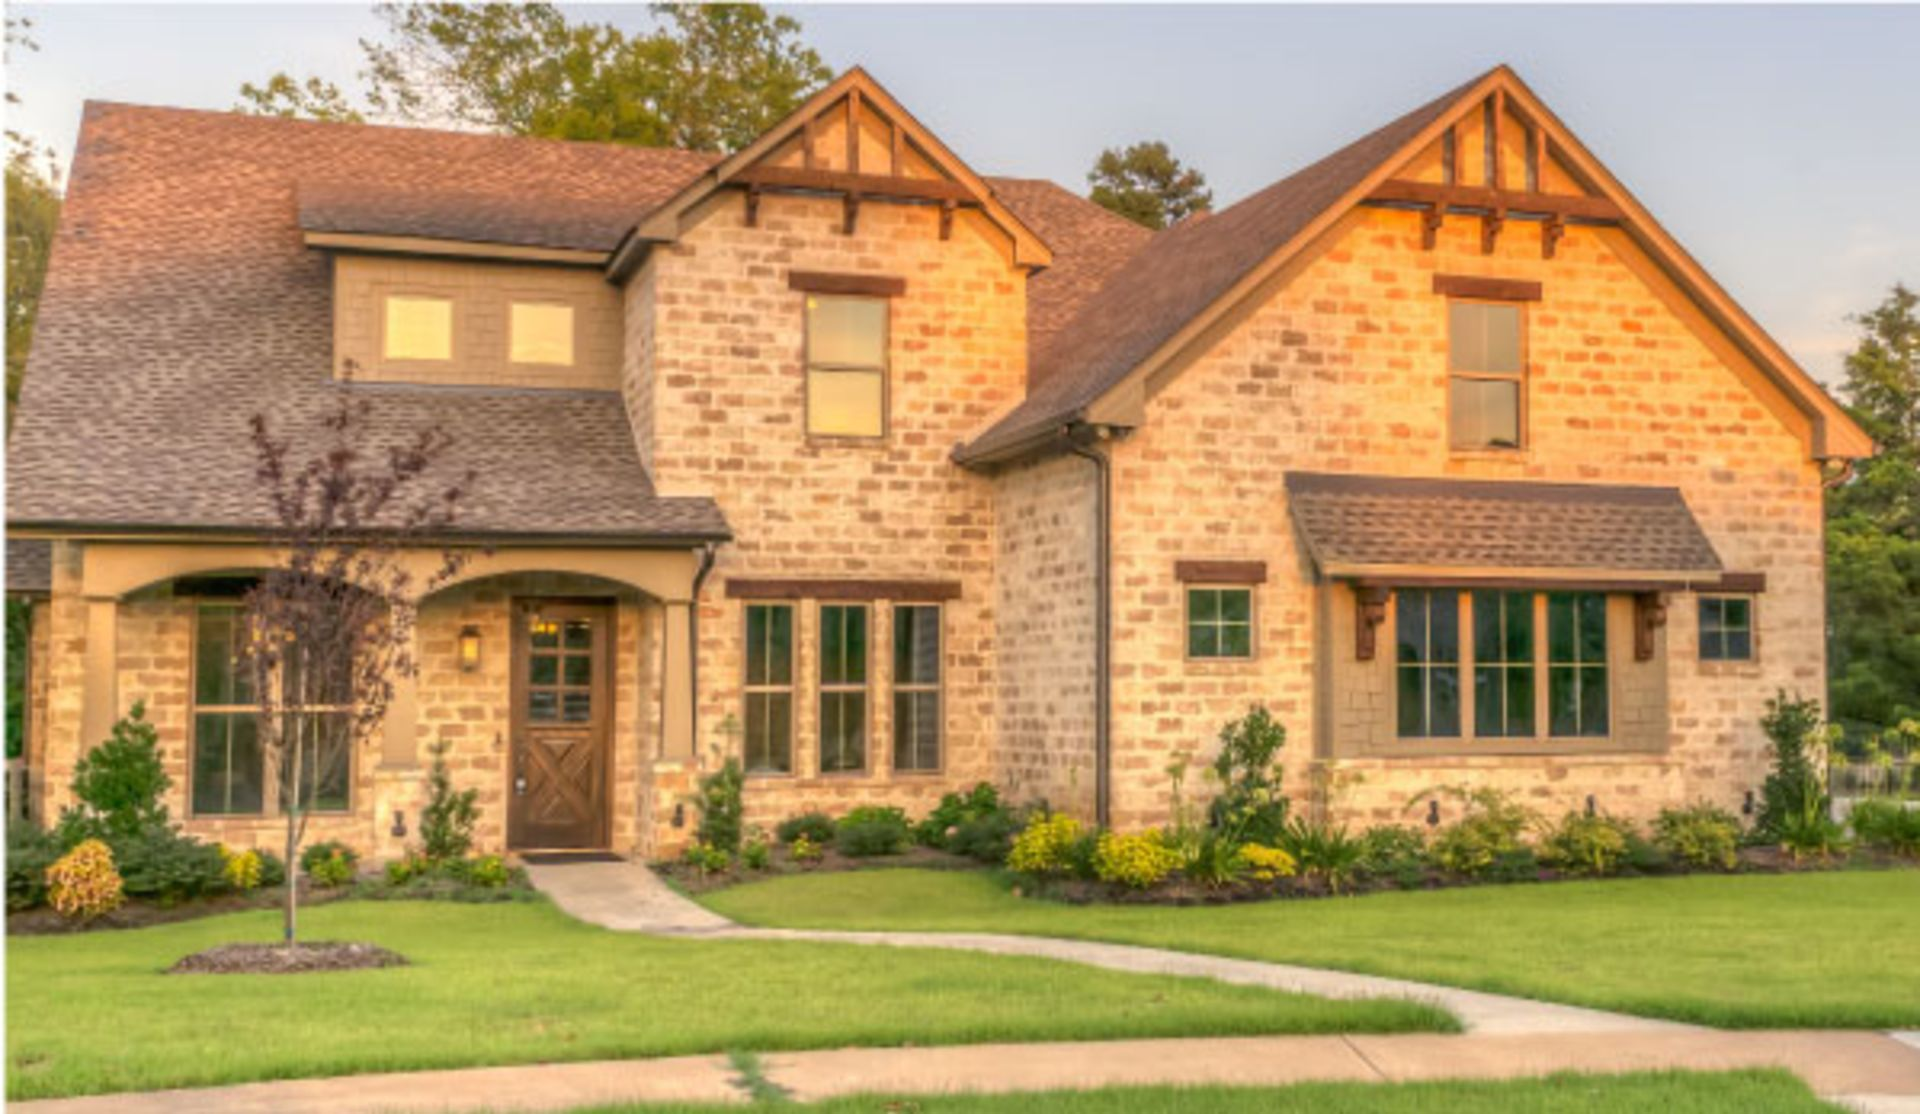 Home Sale Contingencies in Texas